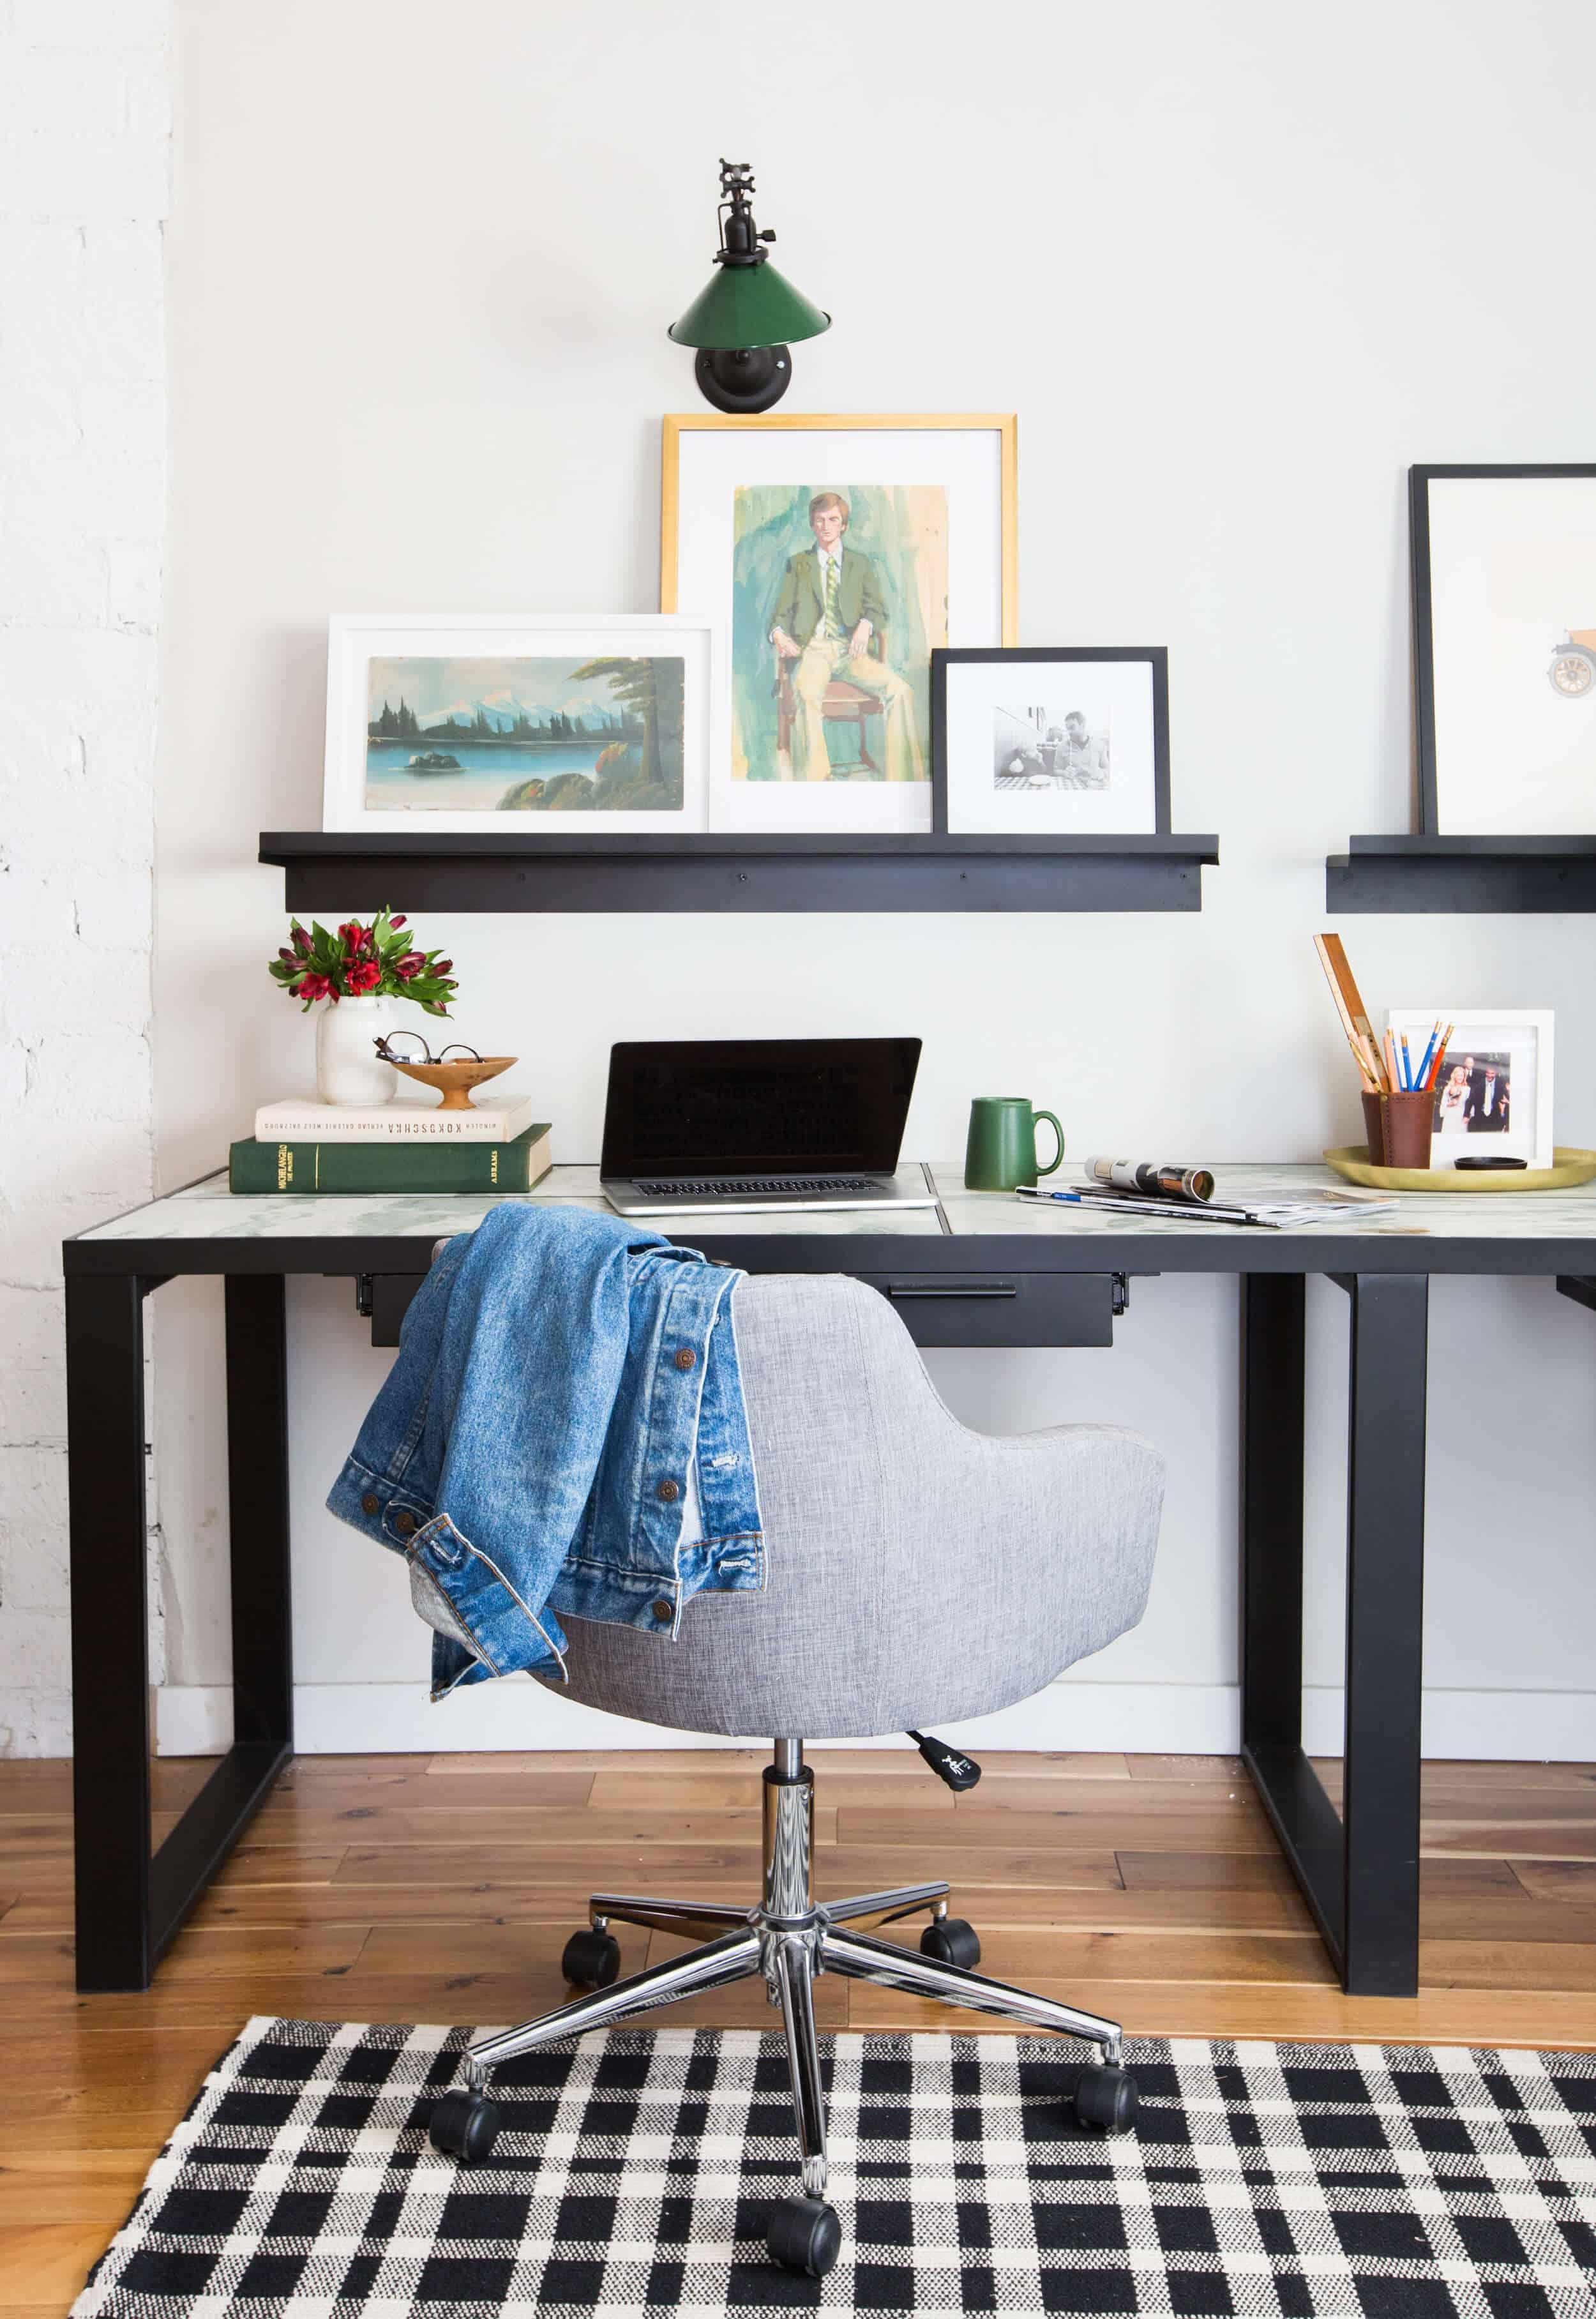 emily-henderson_framebridge_art-ledge_brians-office_masculine-office_guy_green_plaid-rug_workspace_modern_eclectic_2